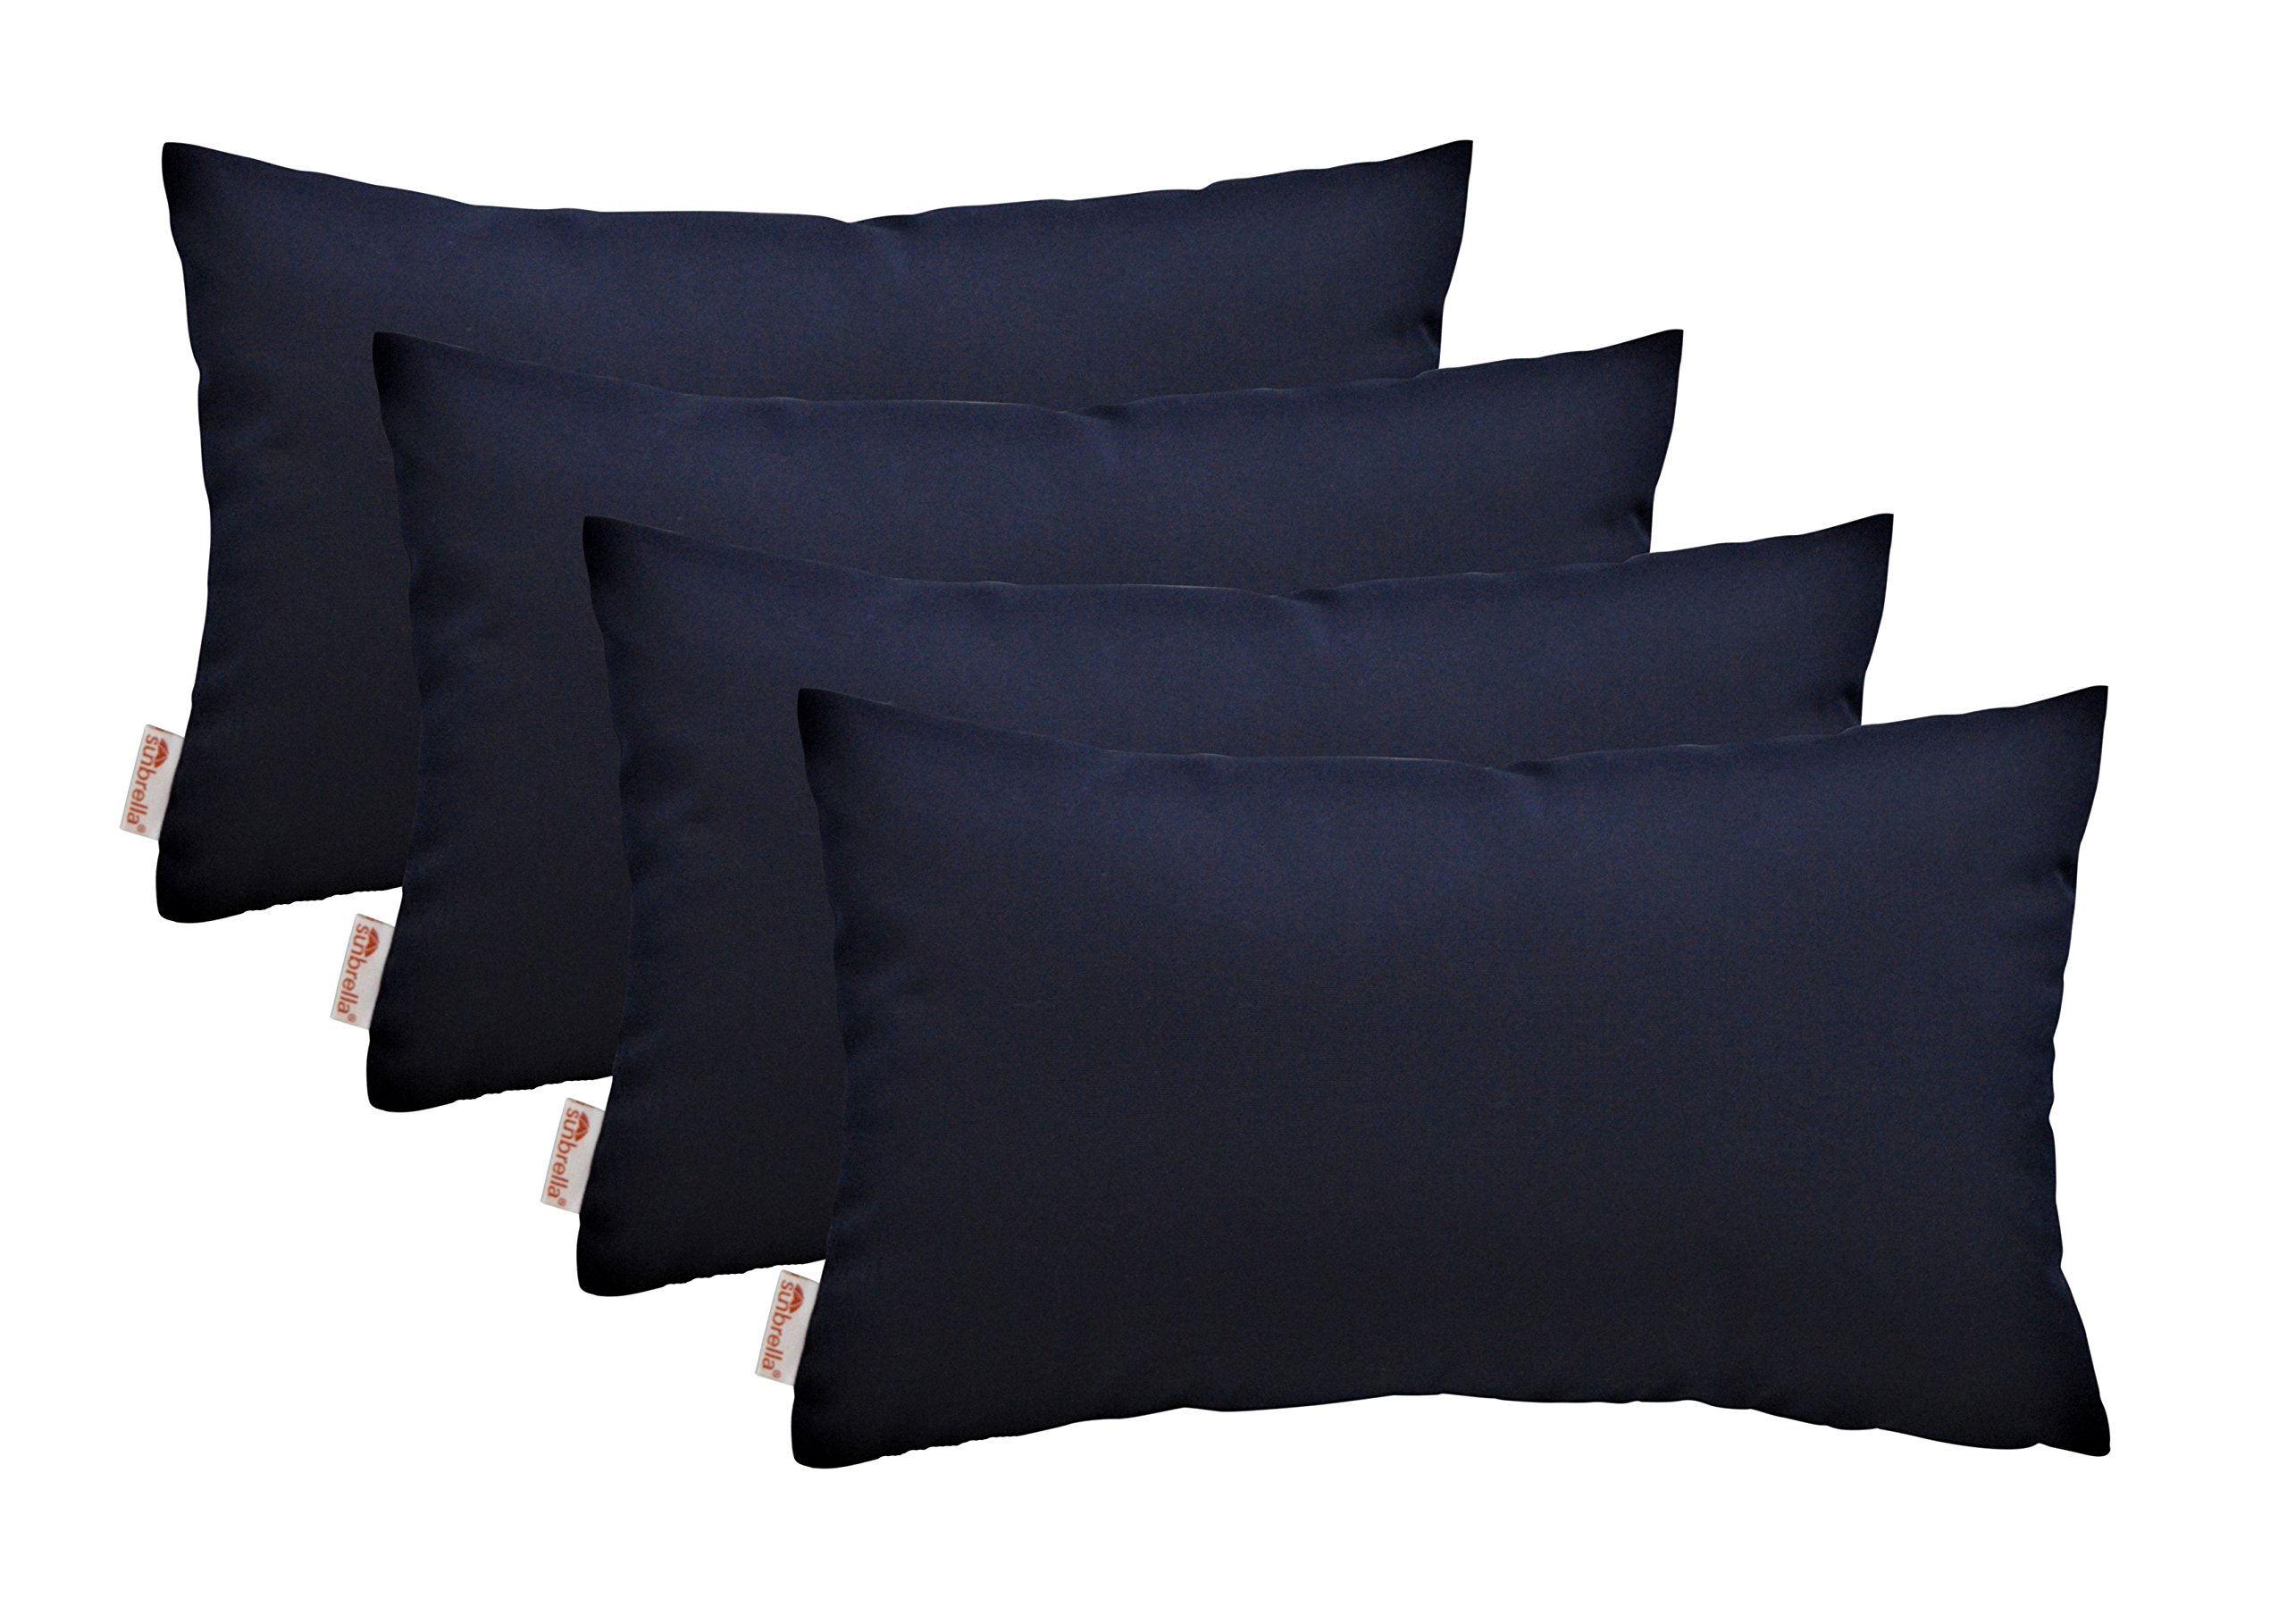 RSH Décor Set of 4 Indoor Outdoor Decorative Rectangle Lumbar Throw Pillows Sunbrella Canvas Navy (20'' x 12'')